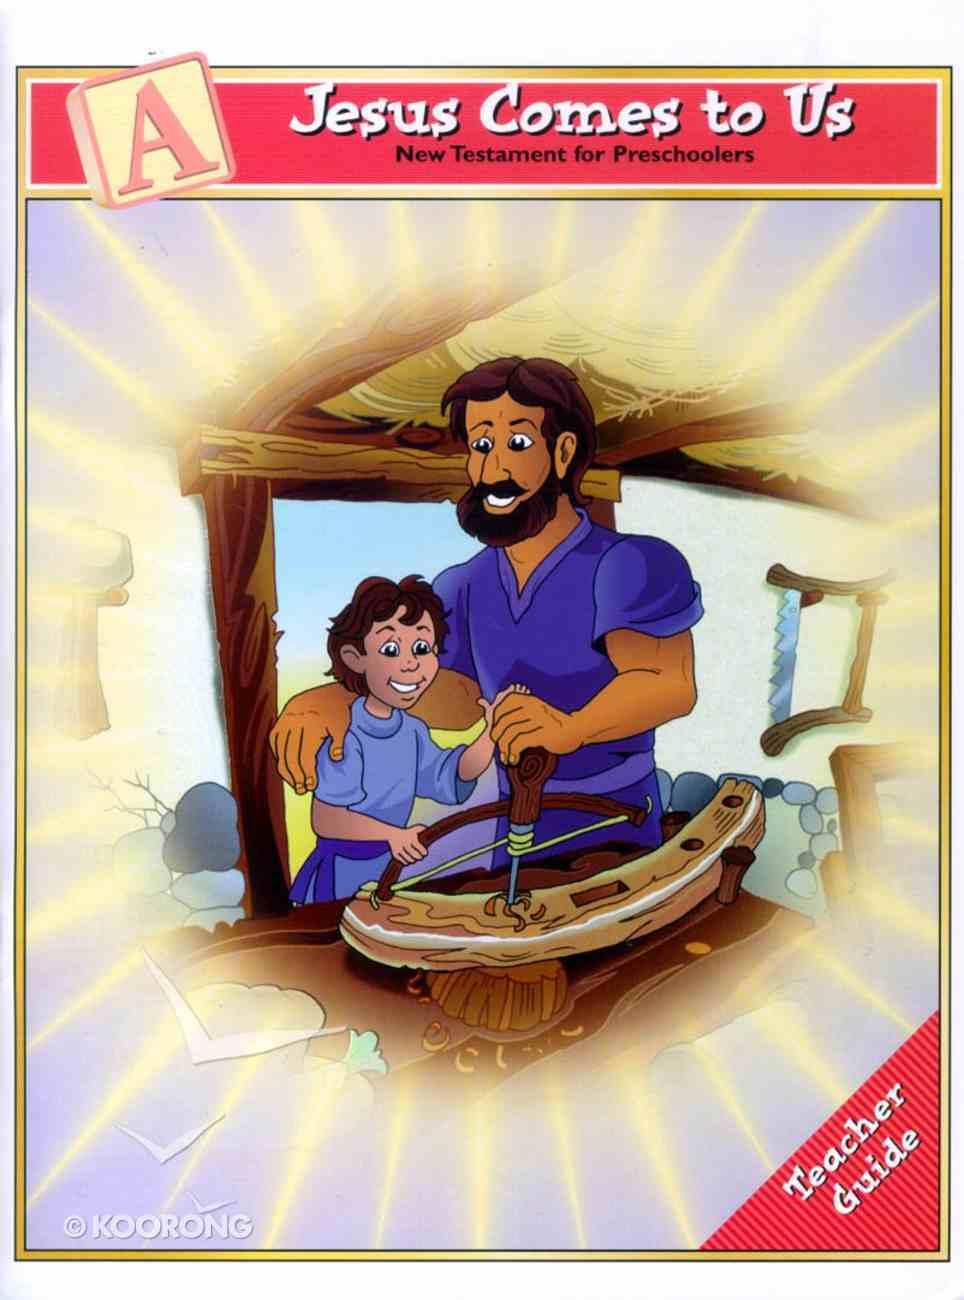 Dlc Preschool: NT, Unit a Ages 2-5 (Teacher) (Discipleland Preschool, Ages 3-5 Series) Paperback